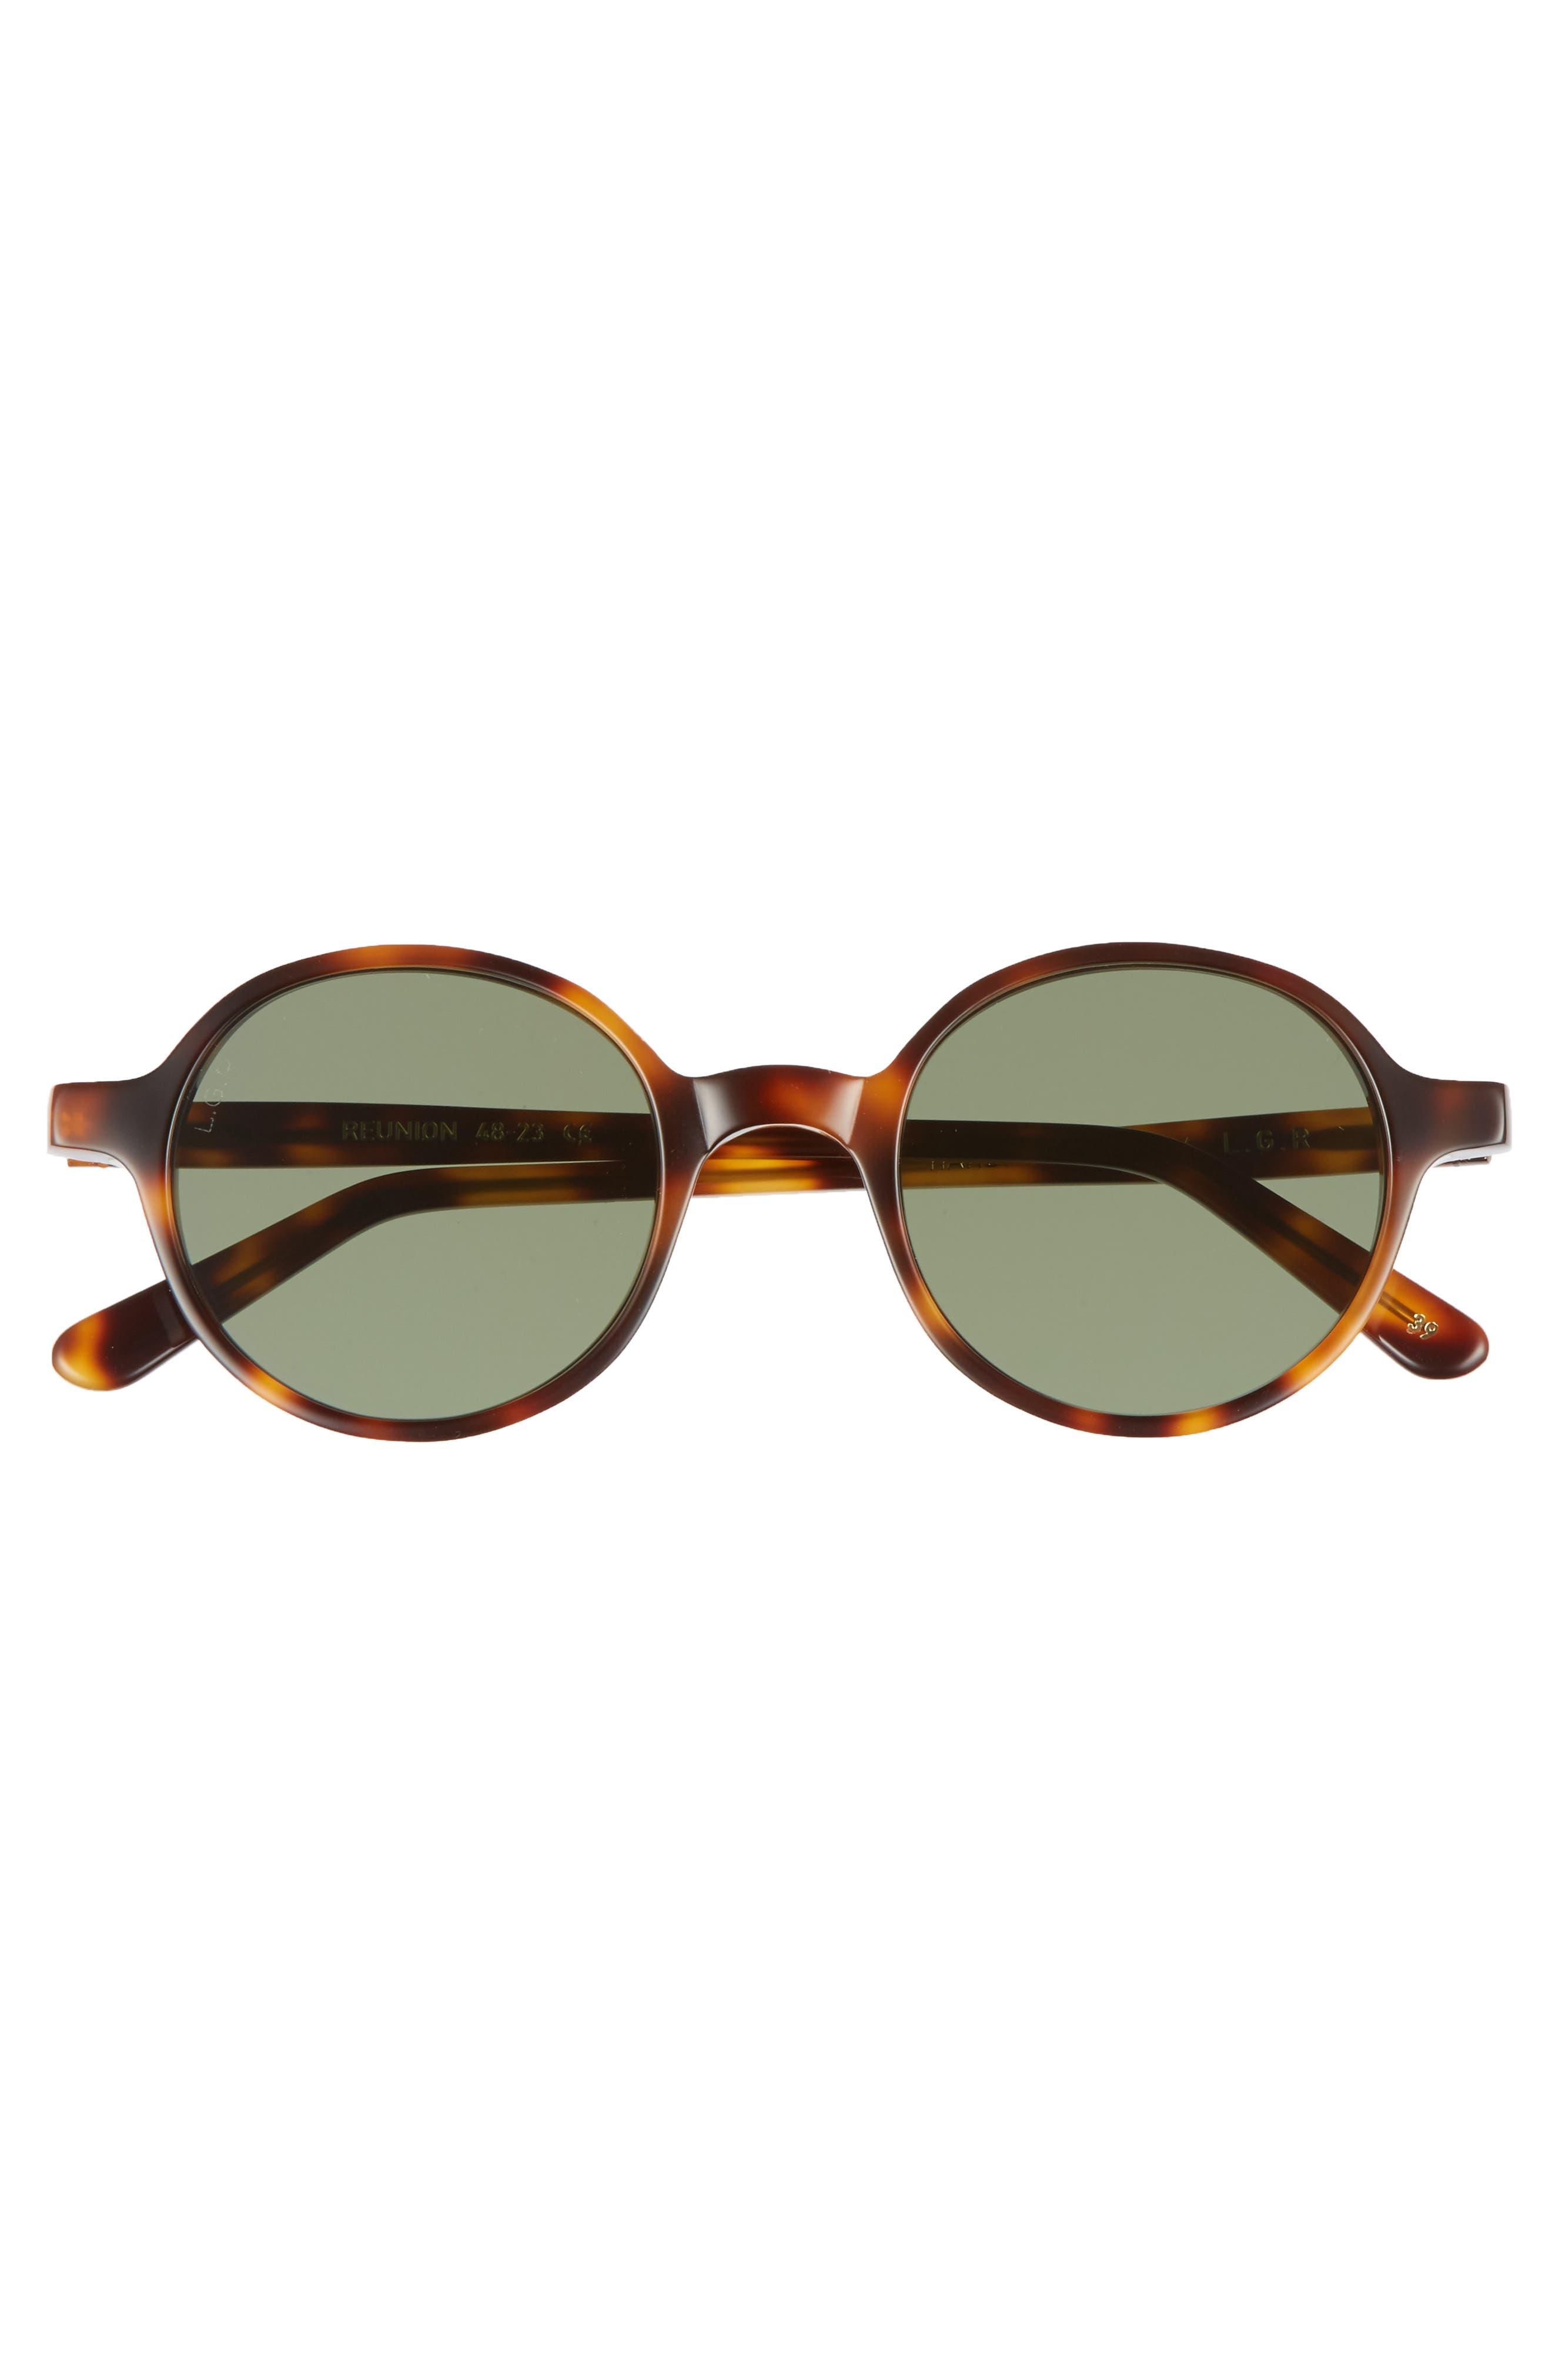 Reunion 48mm Sunglasses,                             Alternate thumbnail 2, color,                             200